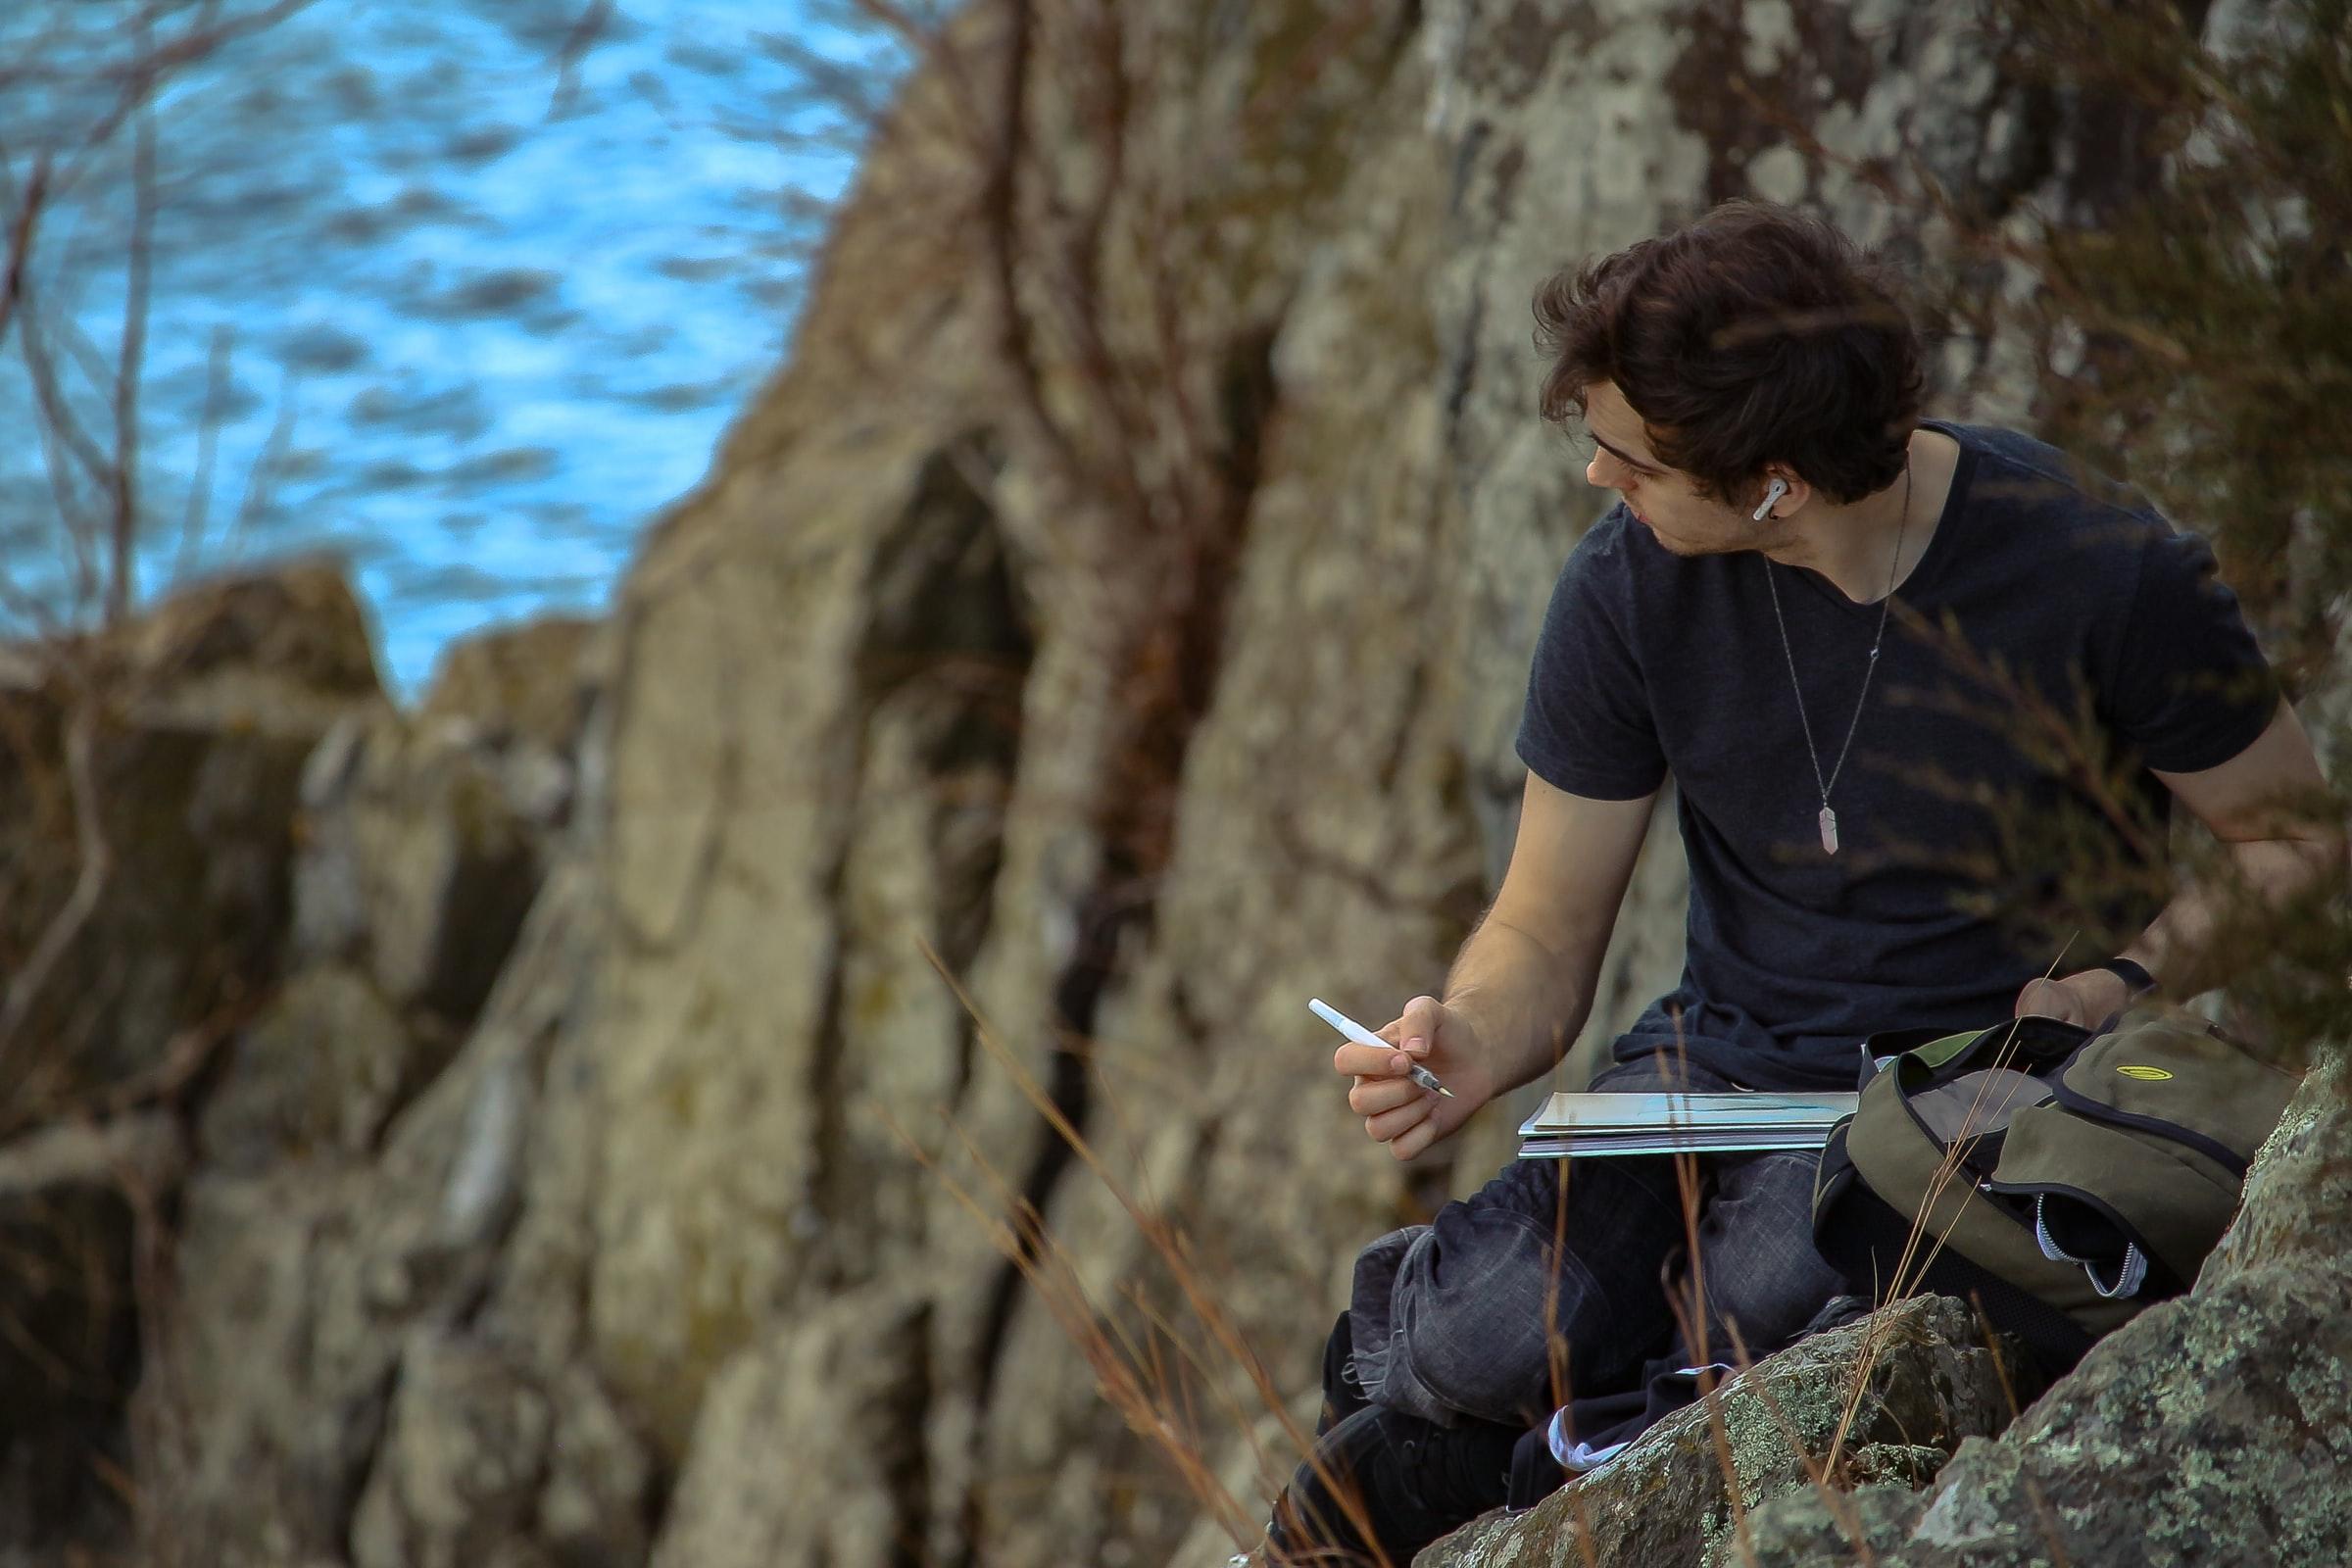 Writing on rocks